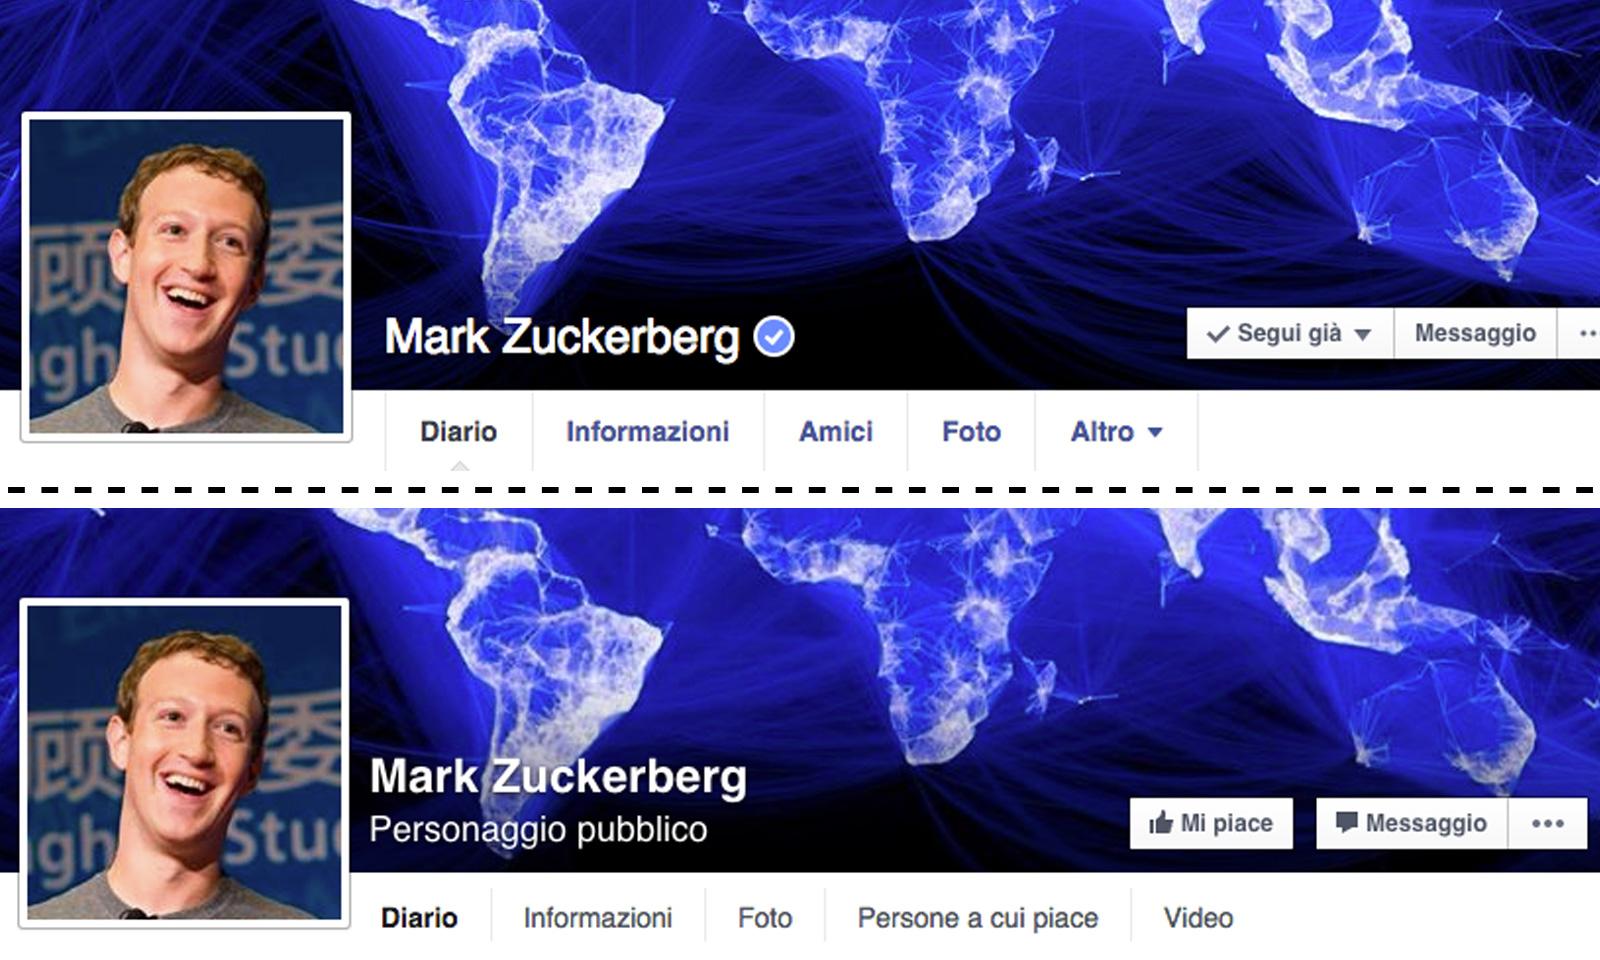 Pagina-Ufficiale-Facebook